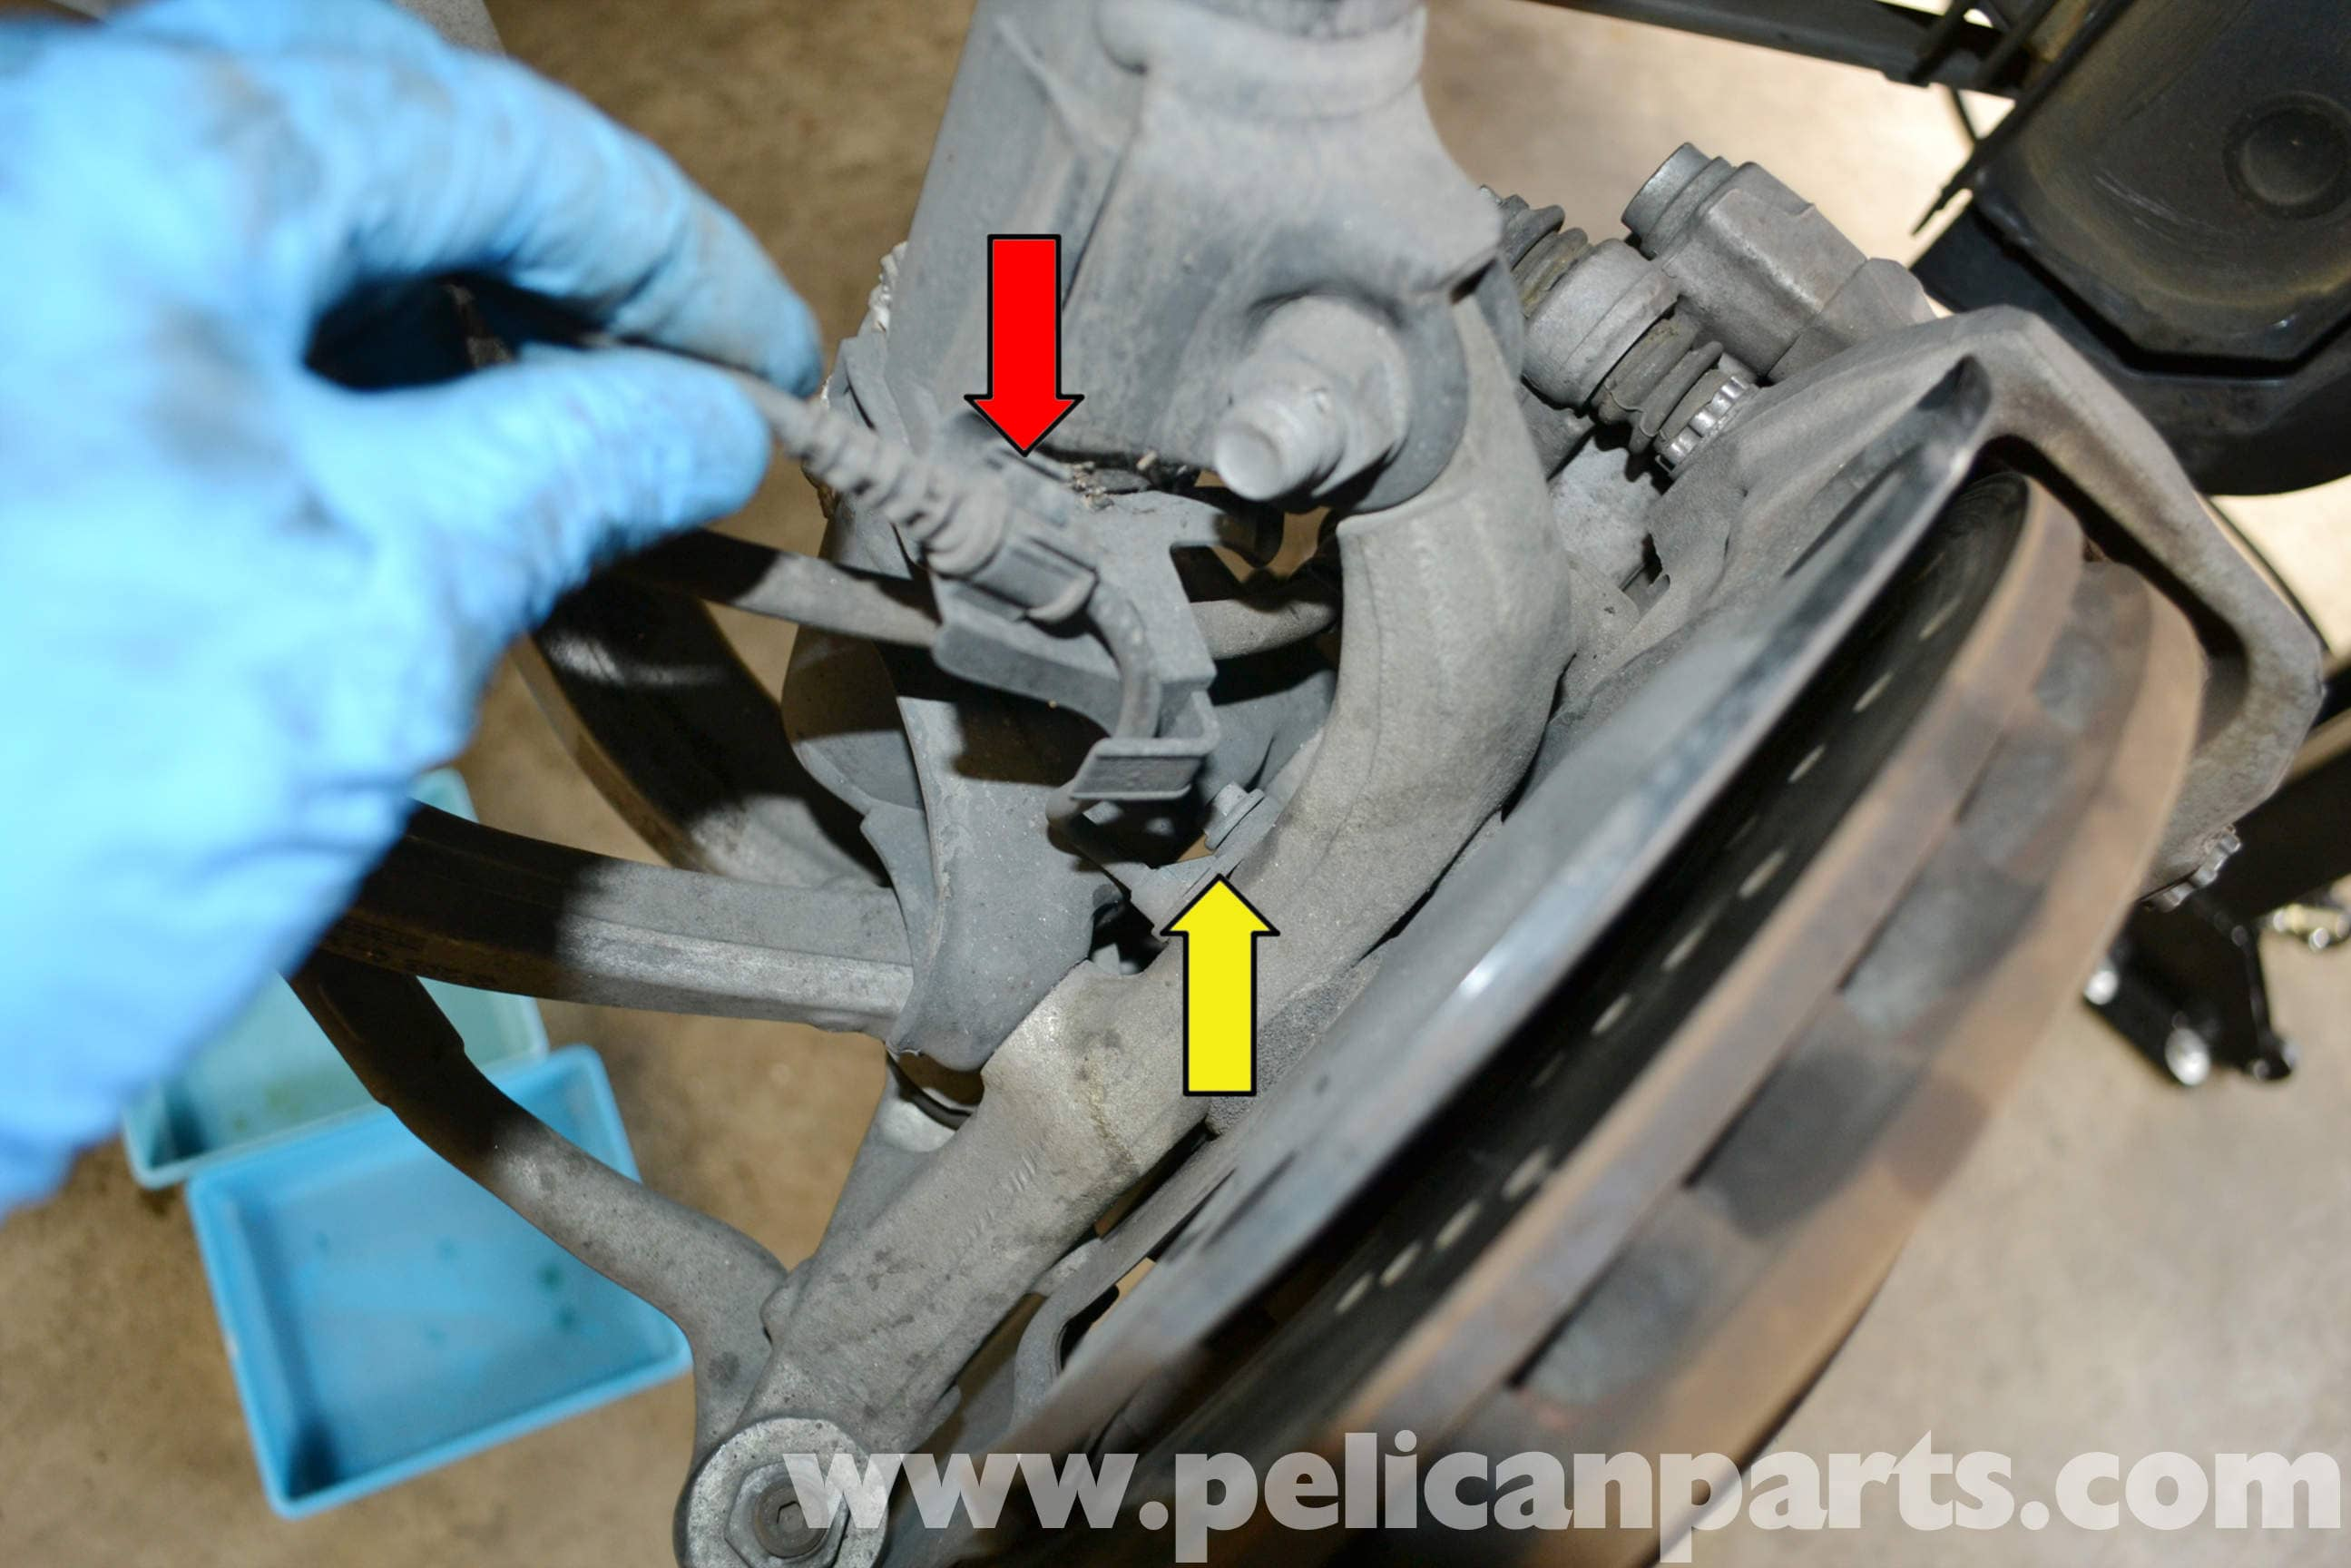 Mercedes-Benz W204 ABS Wheel Speed Sensor Replacement